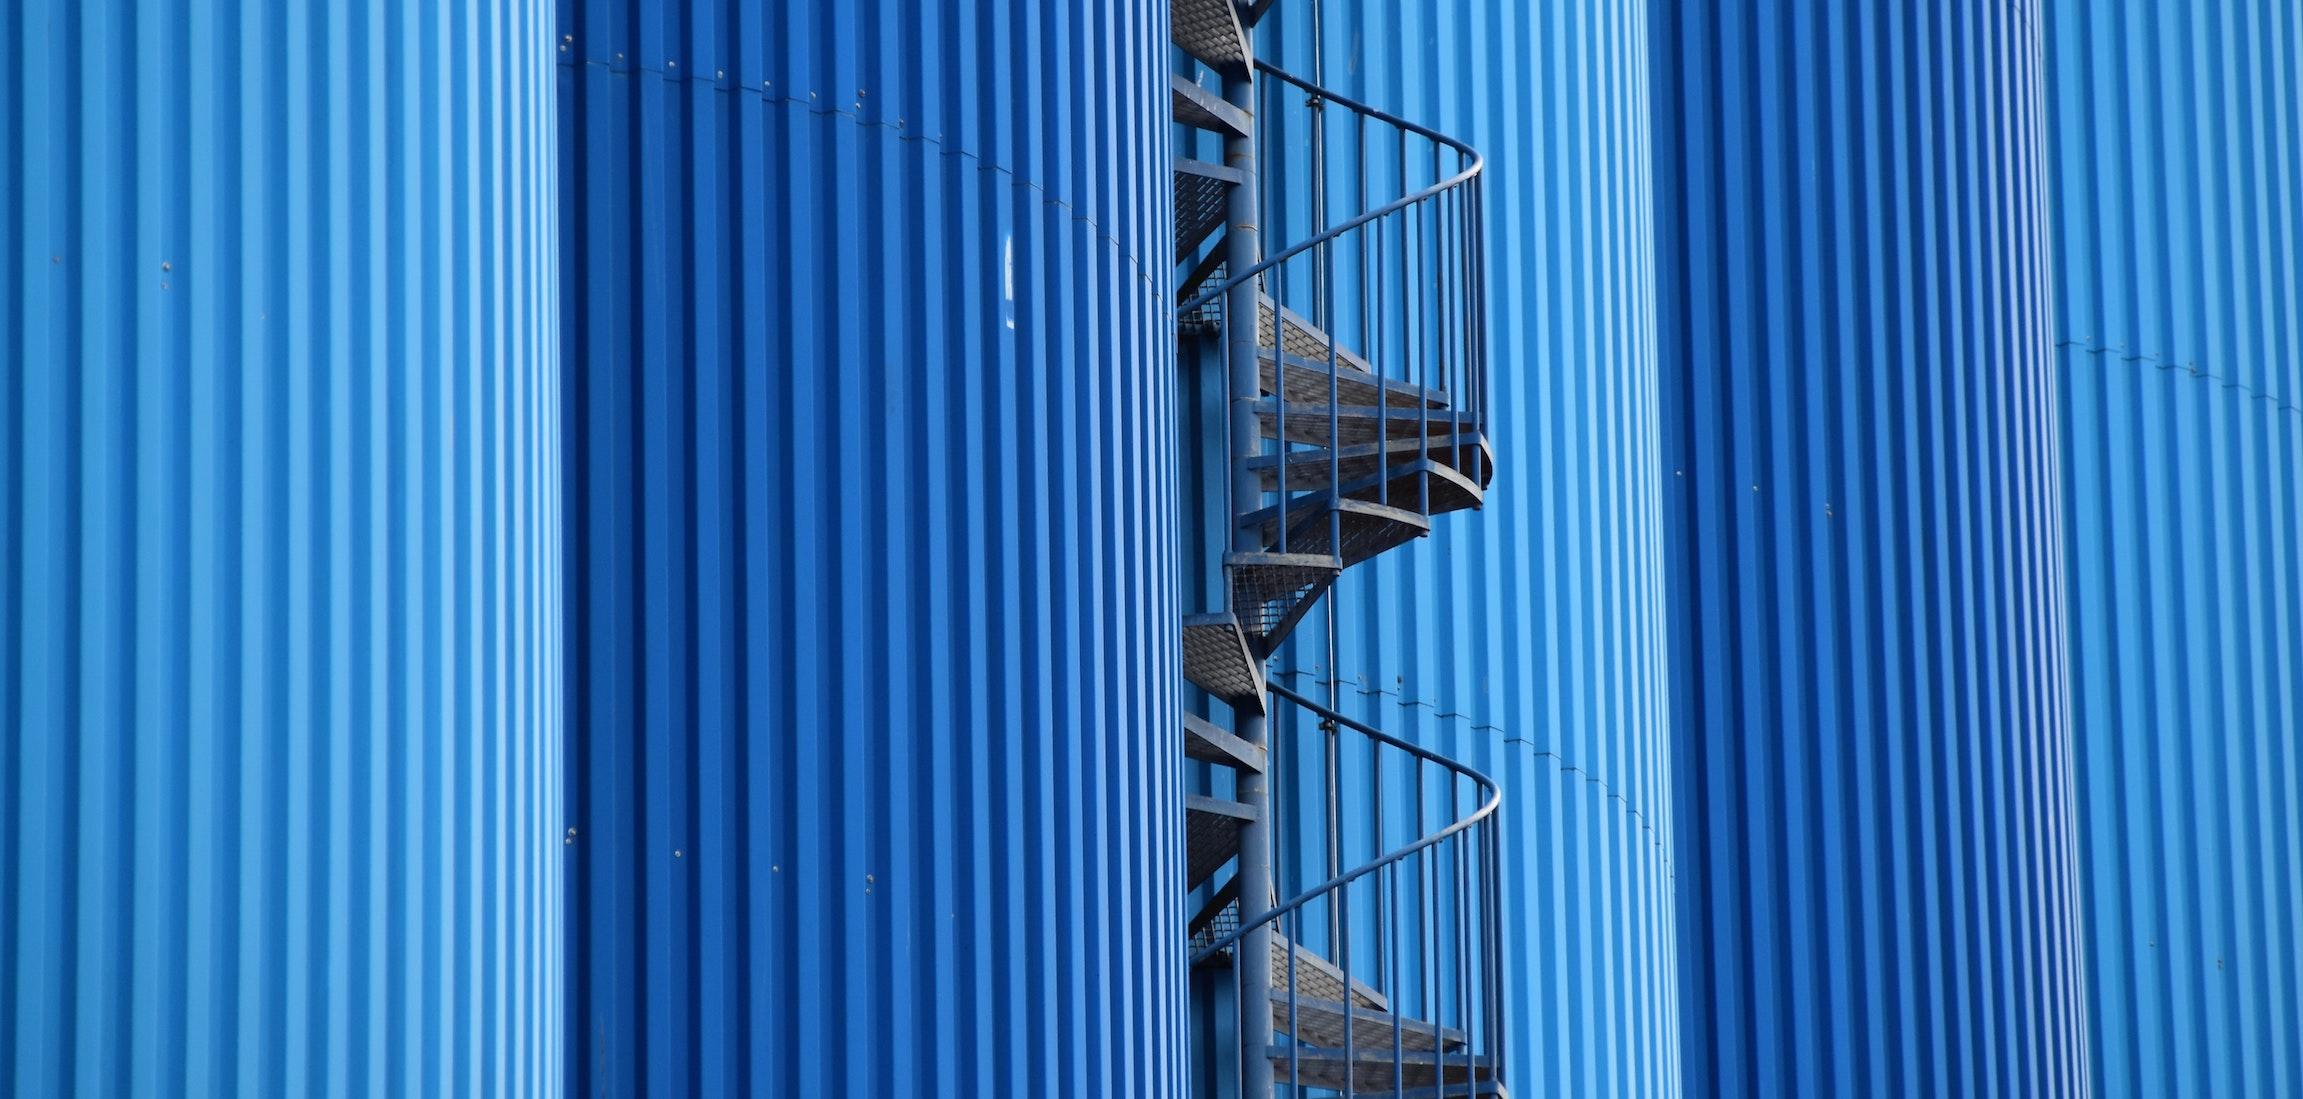 How to break down silos